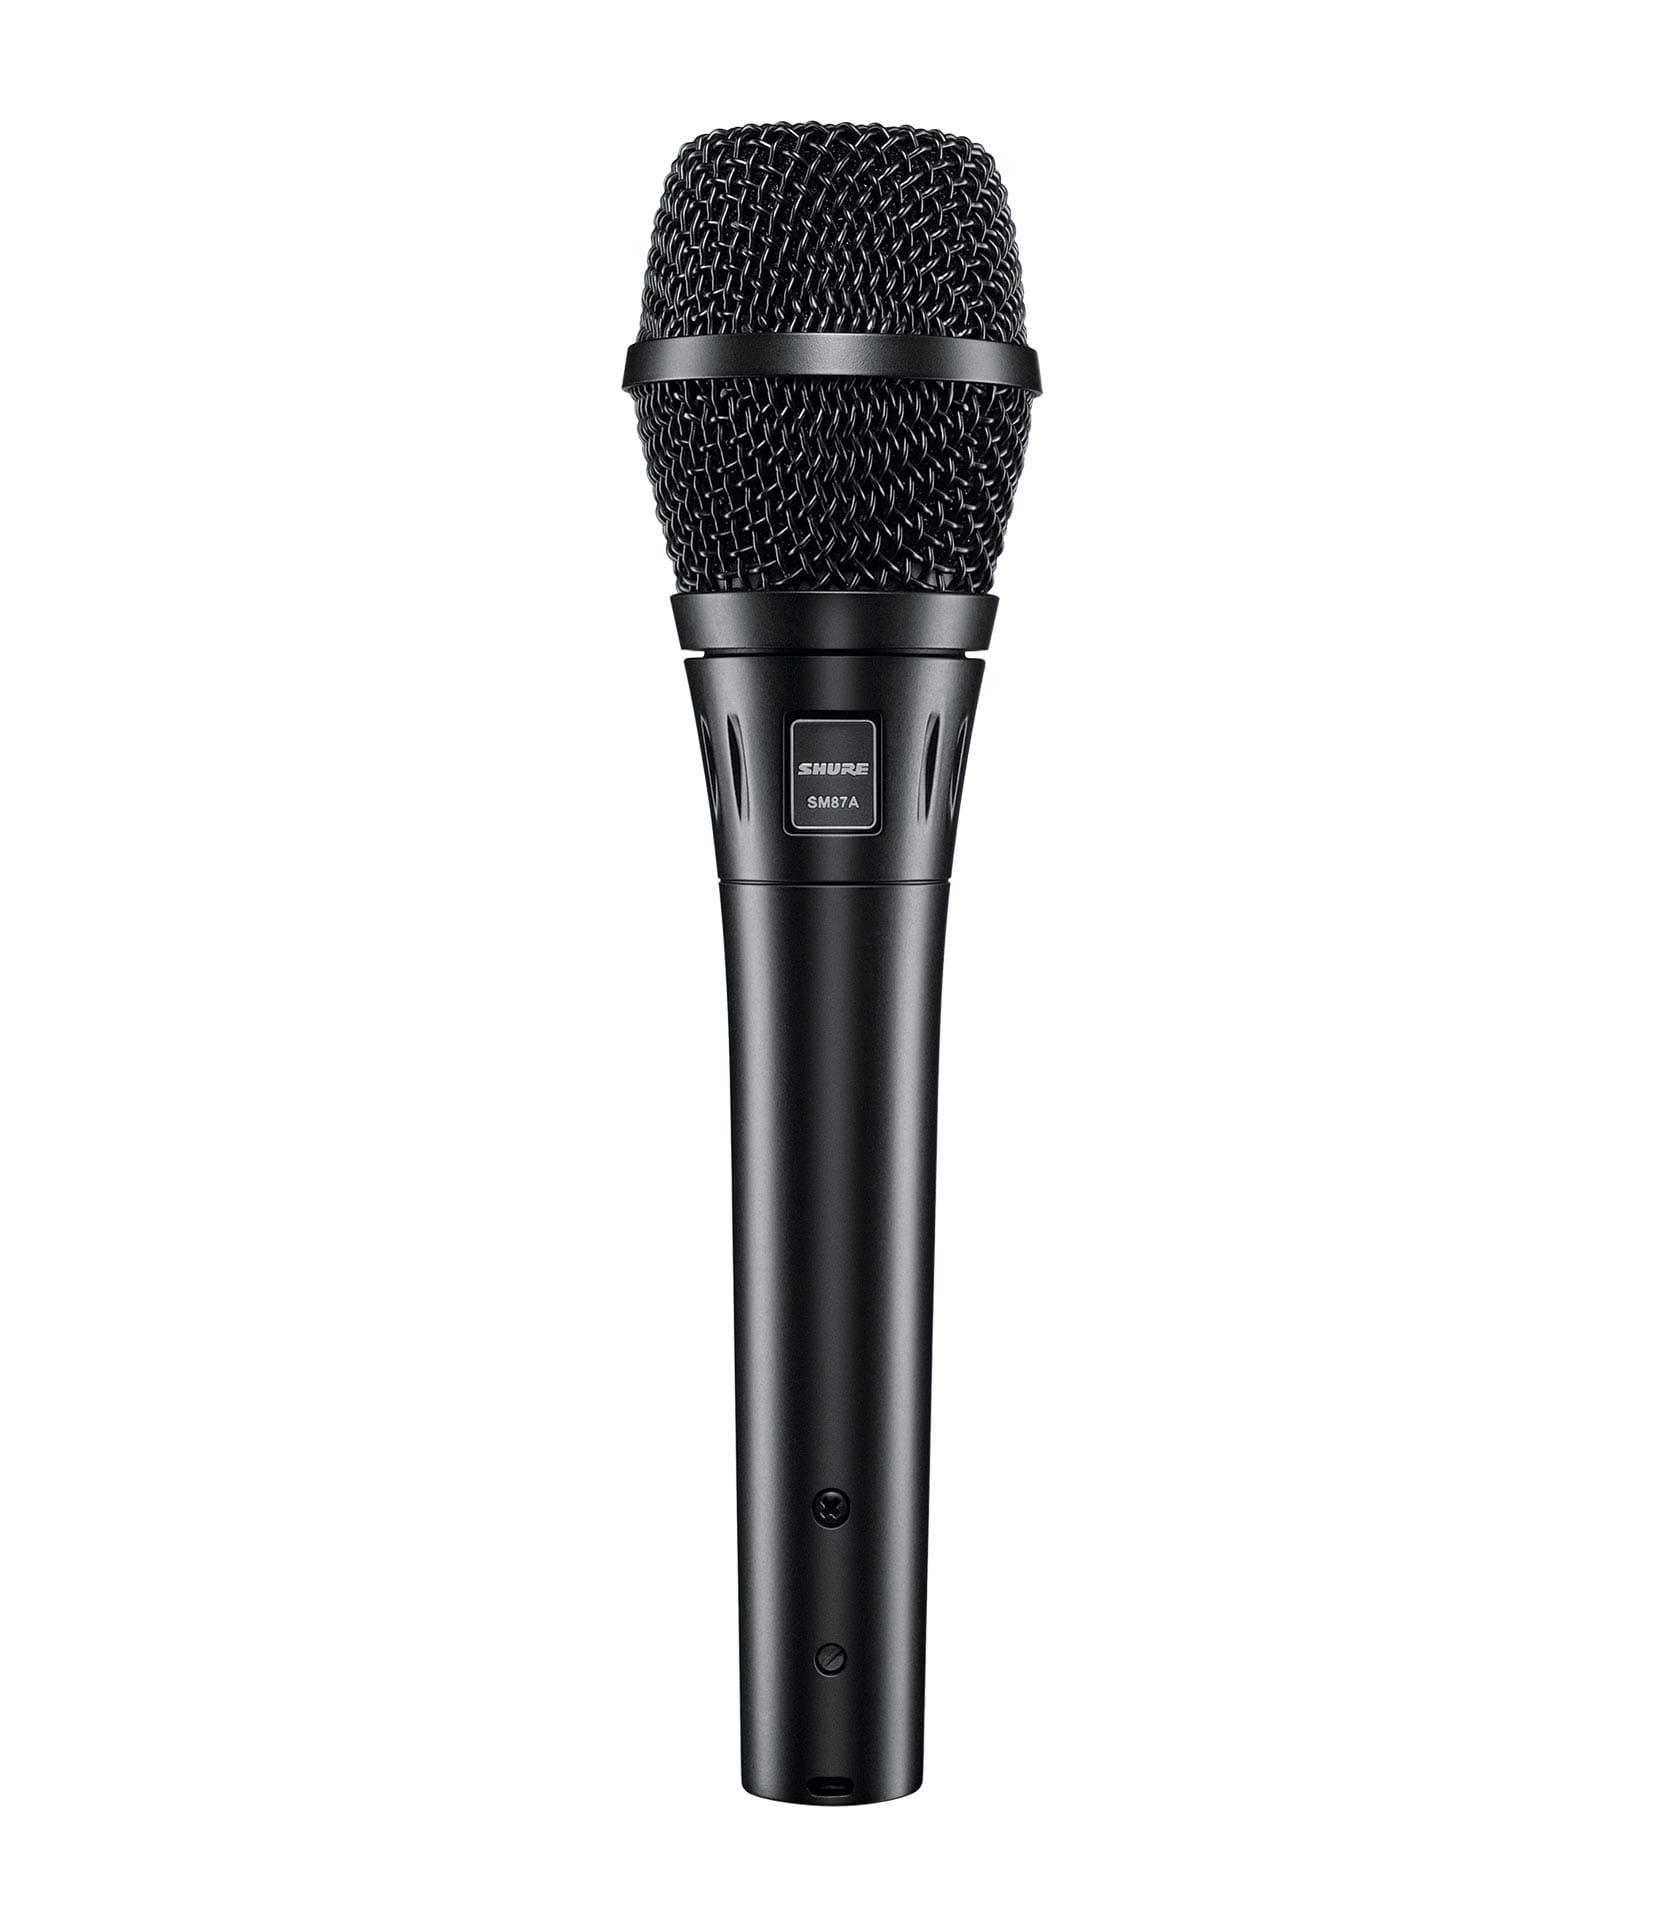 SM87A condenser microphone